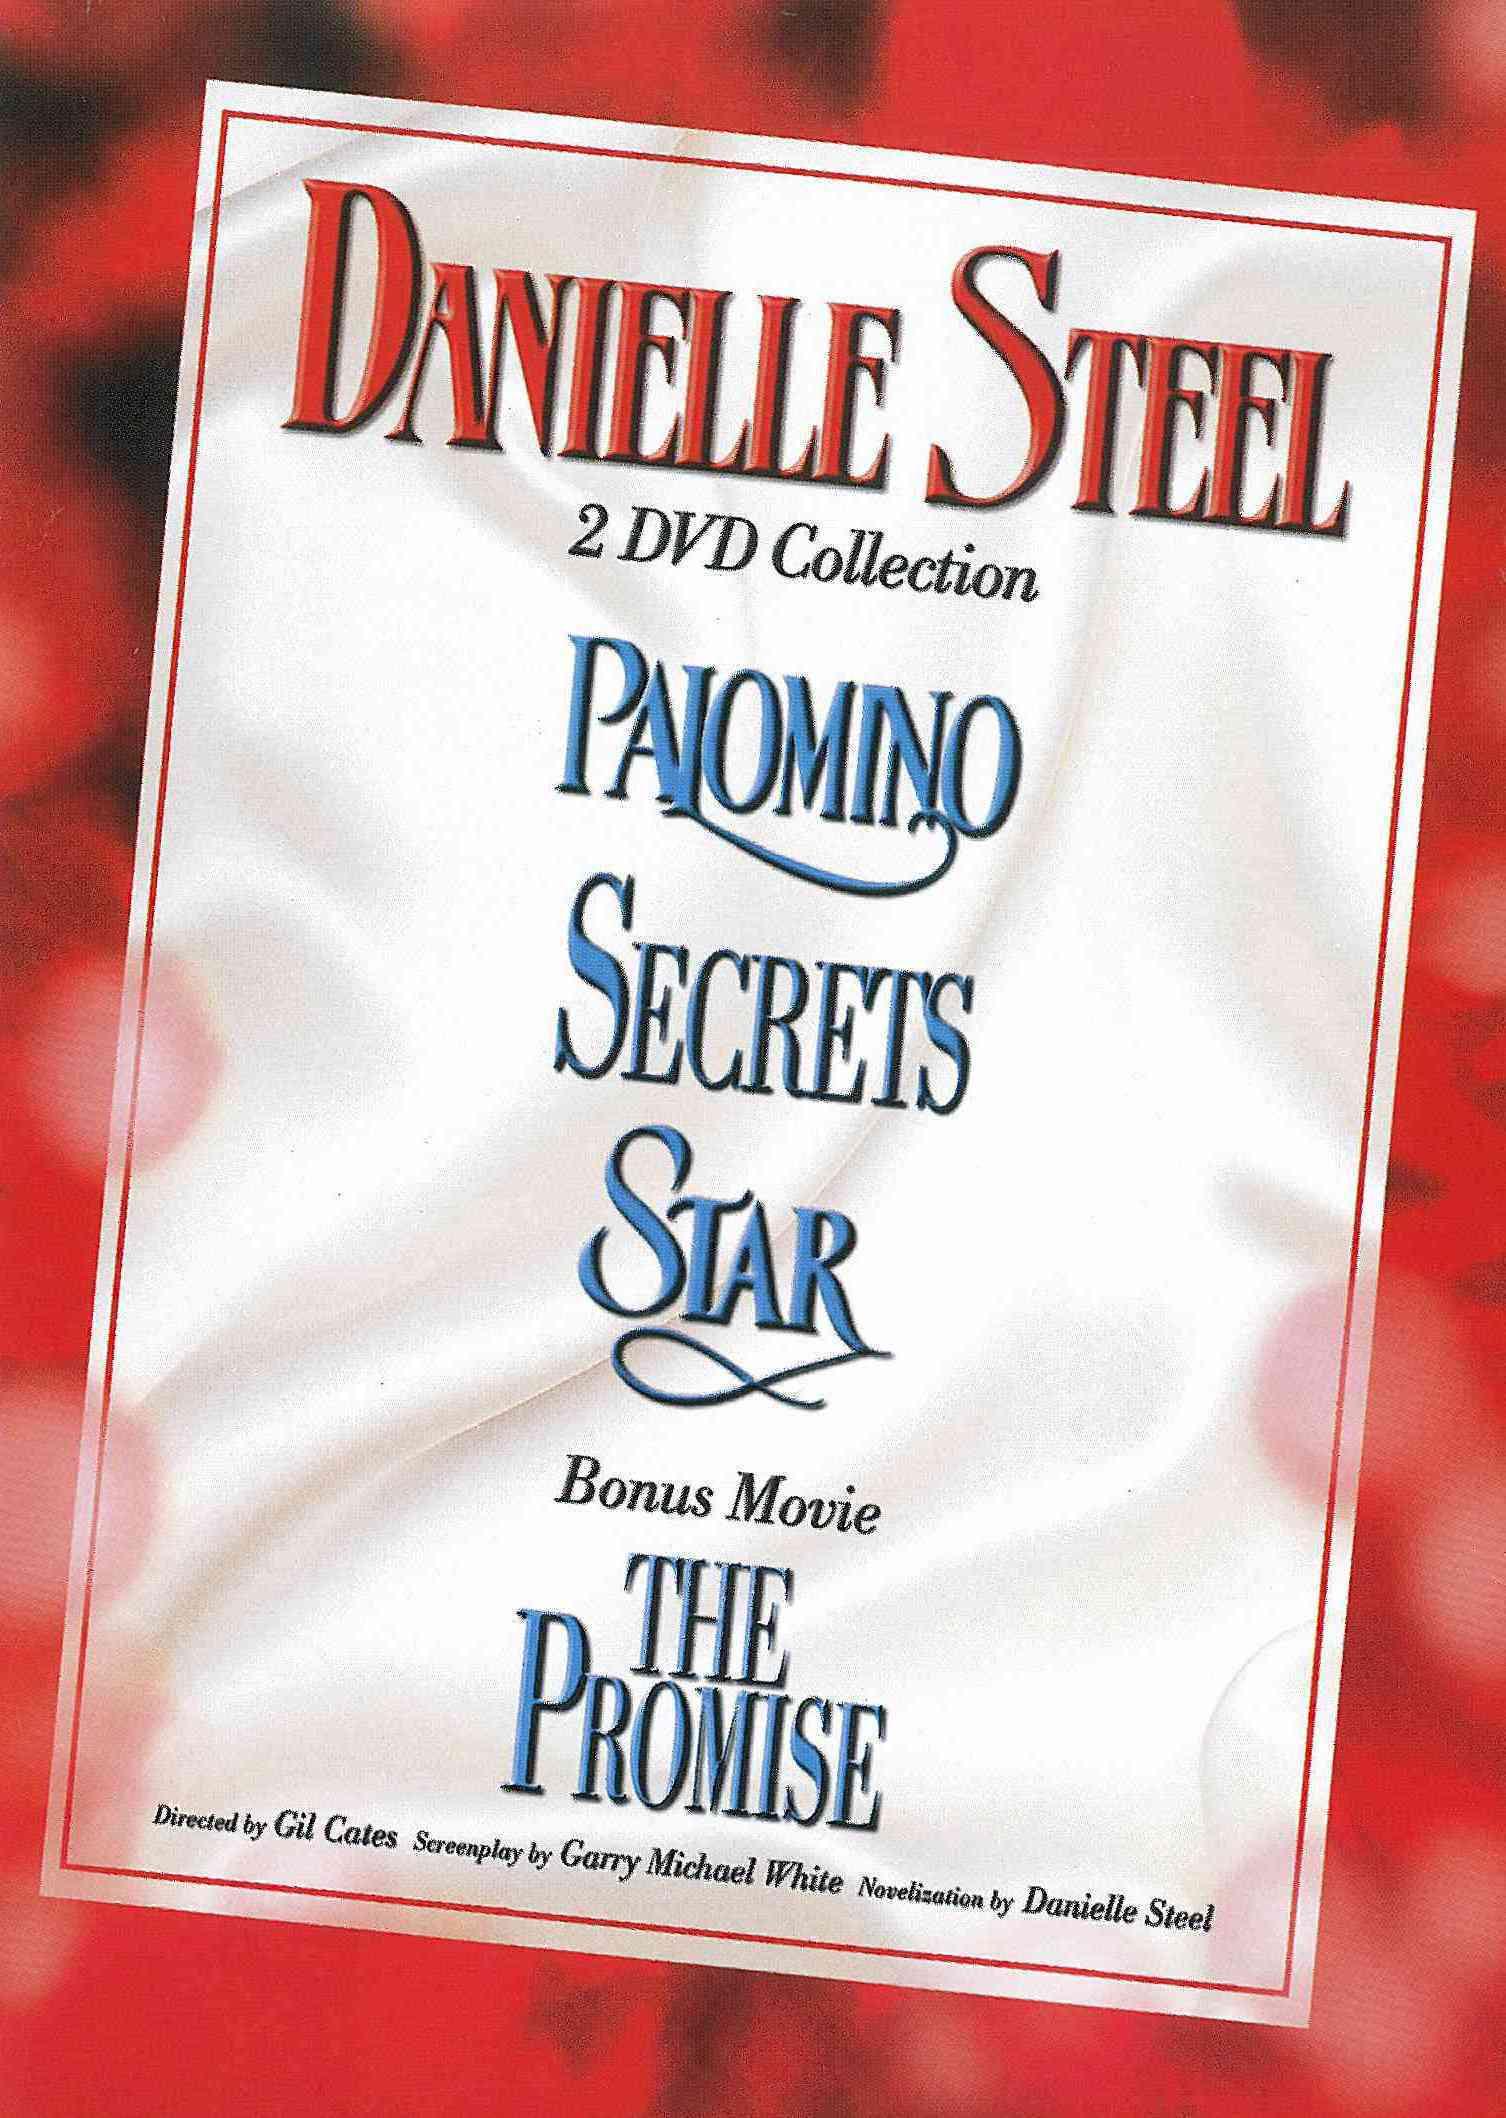 Danielle Steel 2 DVD Collection (DVD)